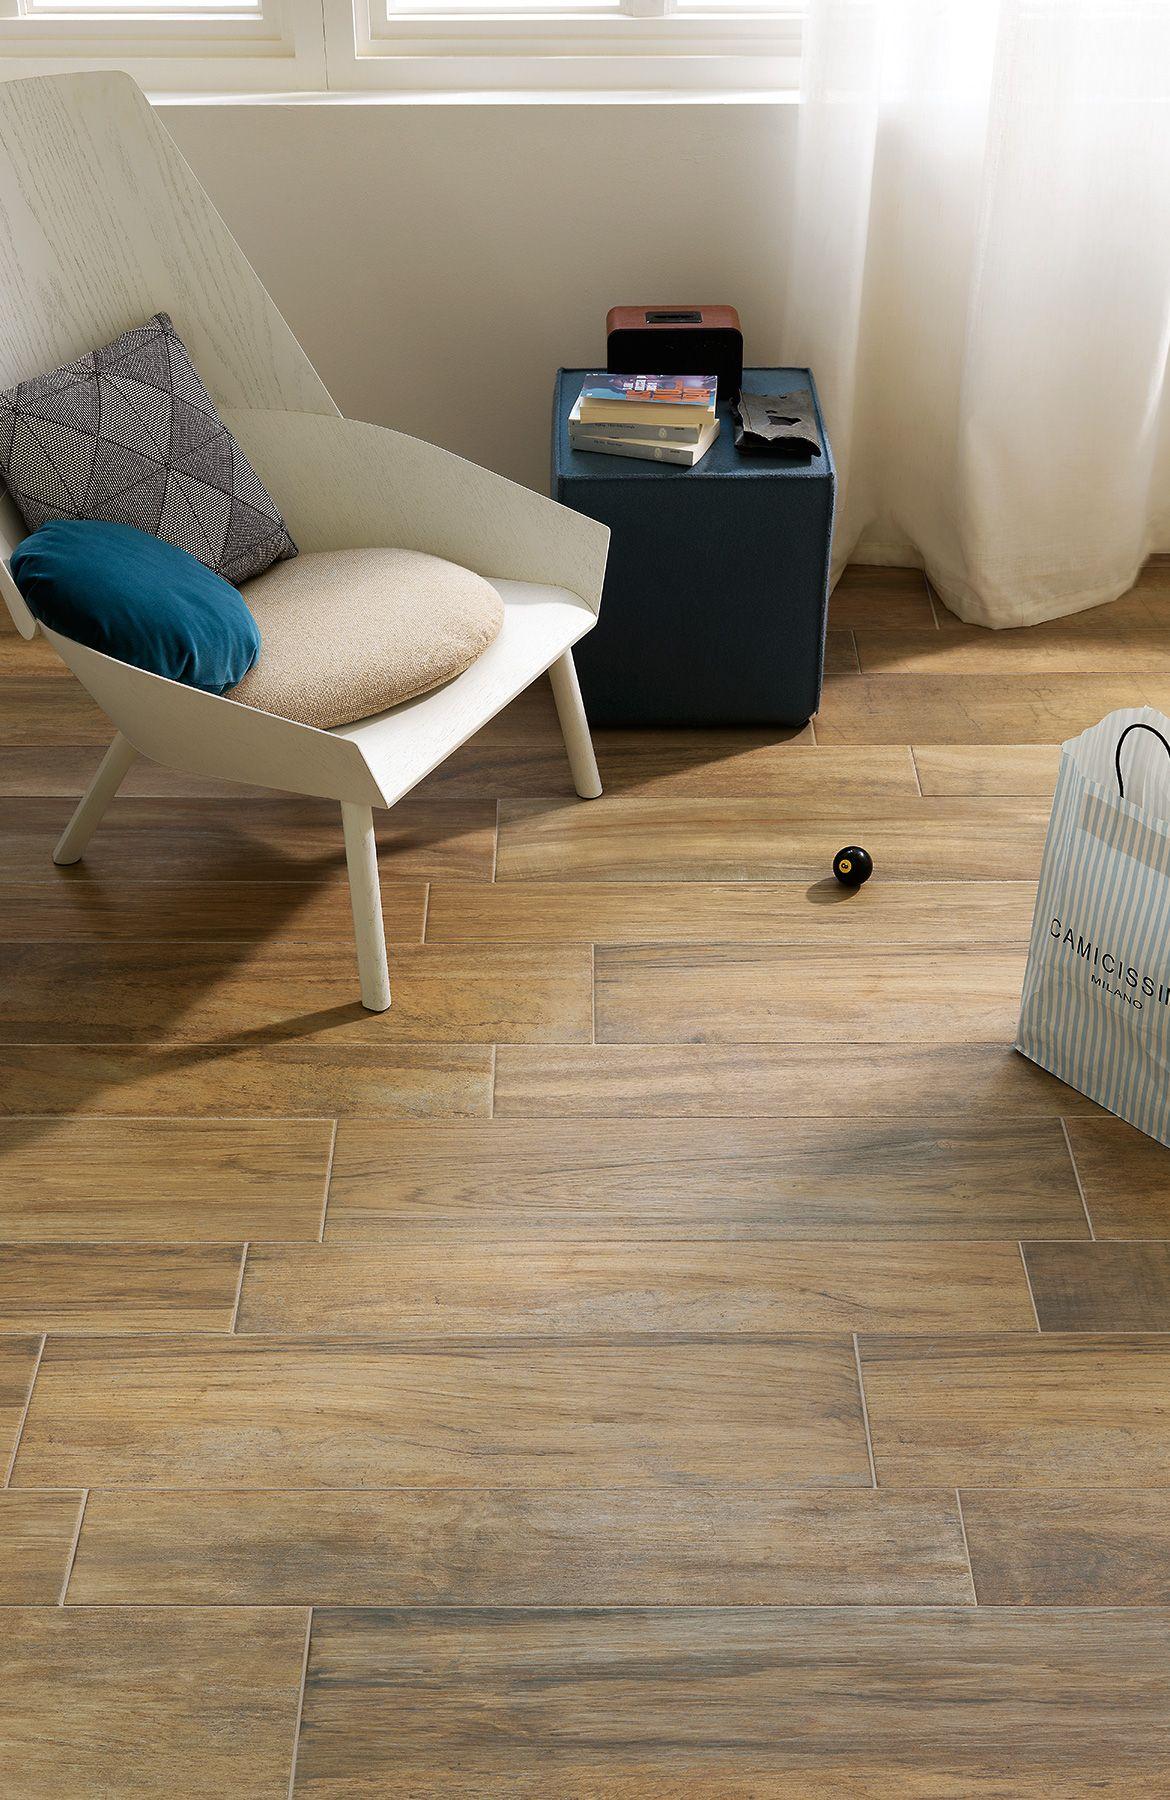 charmant fliesen novabell ideen die besten wohnideen. Black Bedroom Furniture Sets. Home Design Ideas